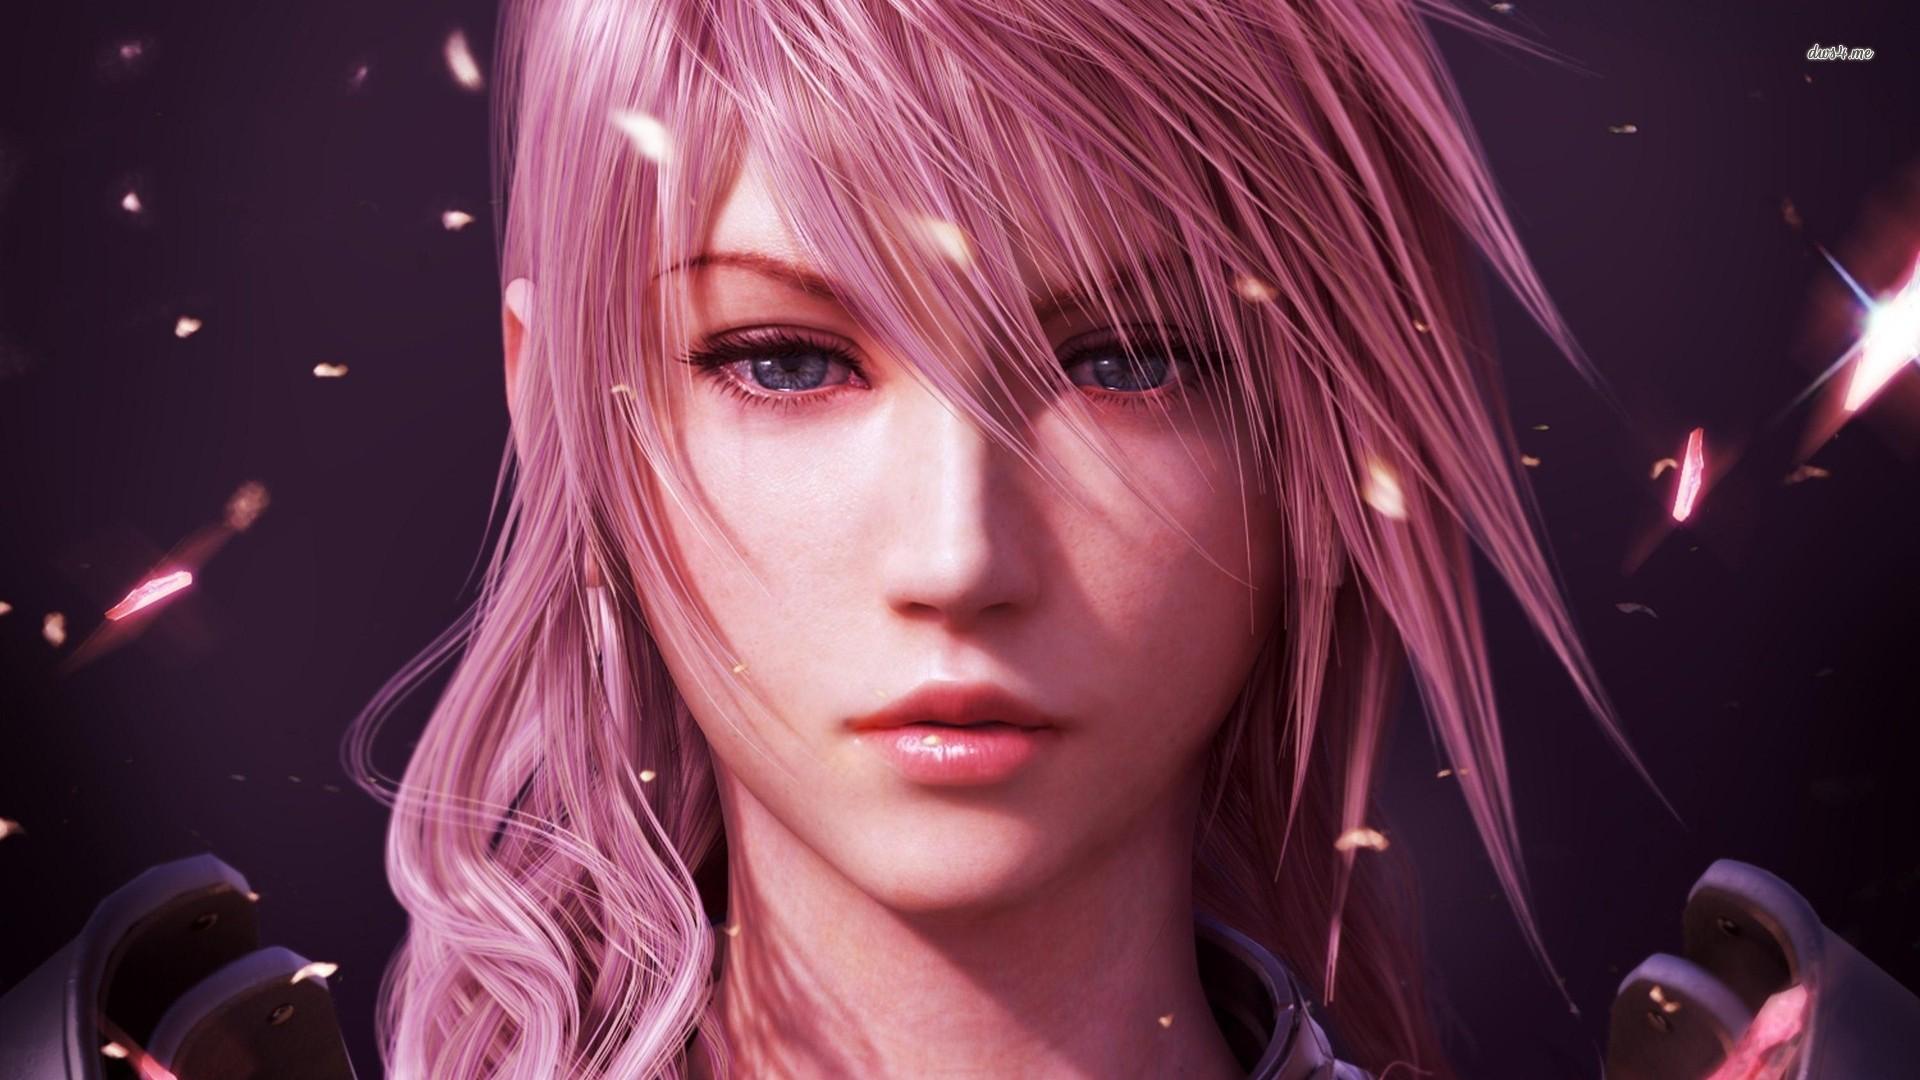 Free Download Lightning Final Fantasy Xiii Wallpaper 1920x1080